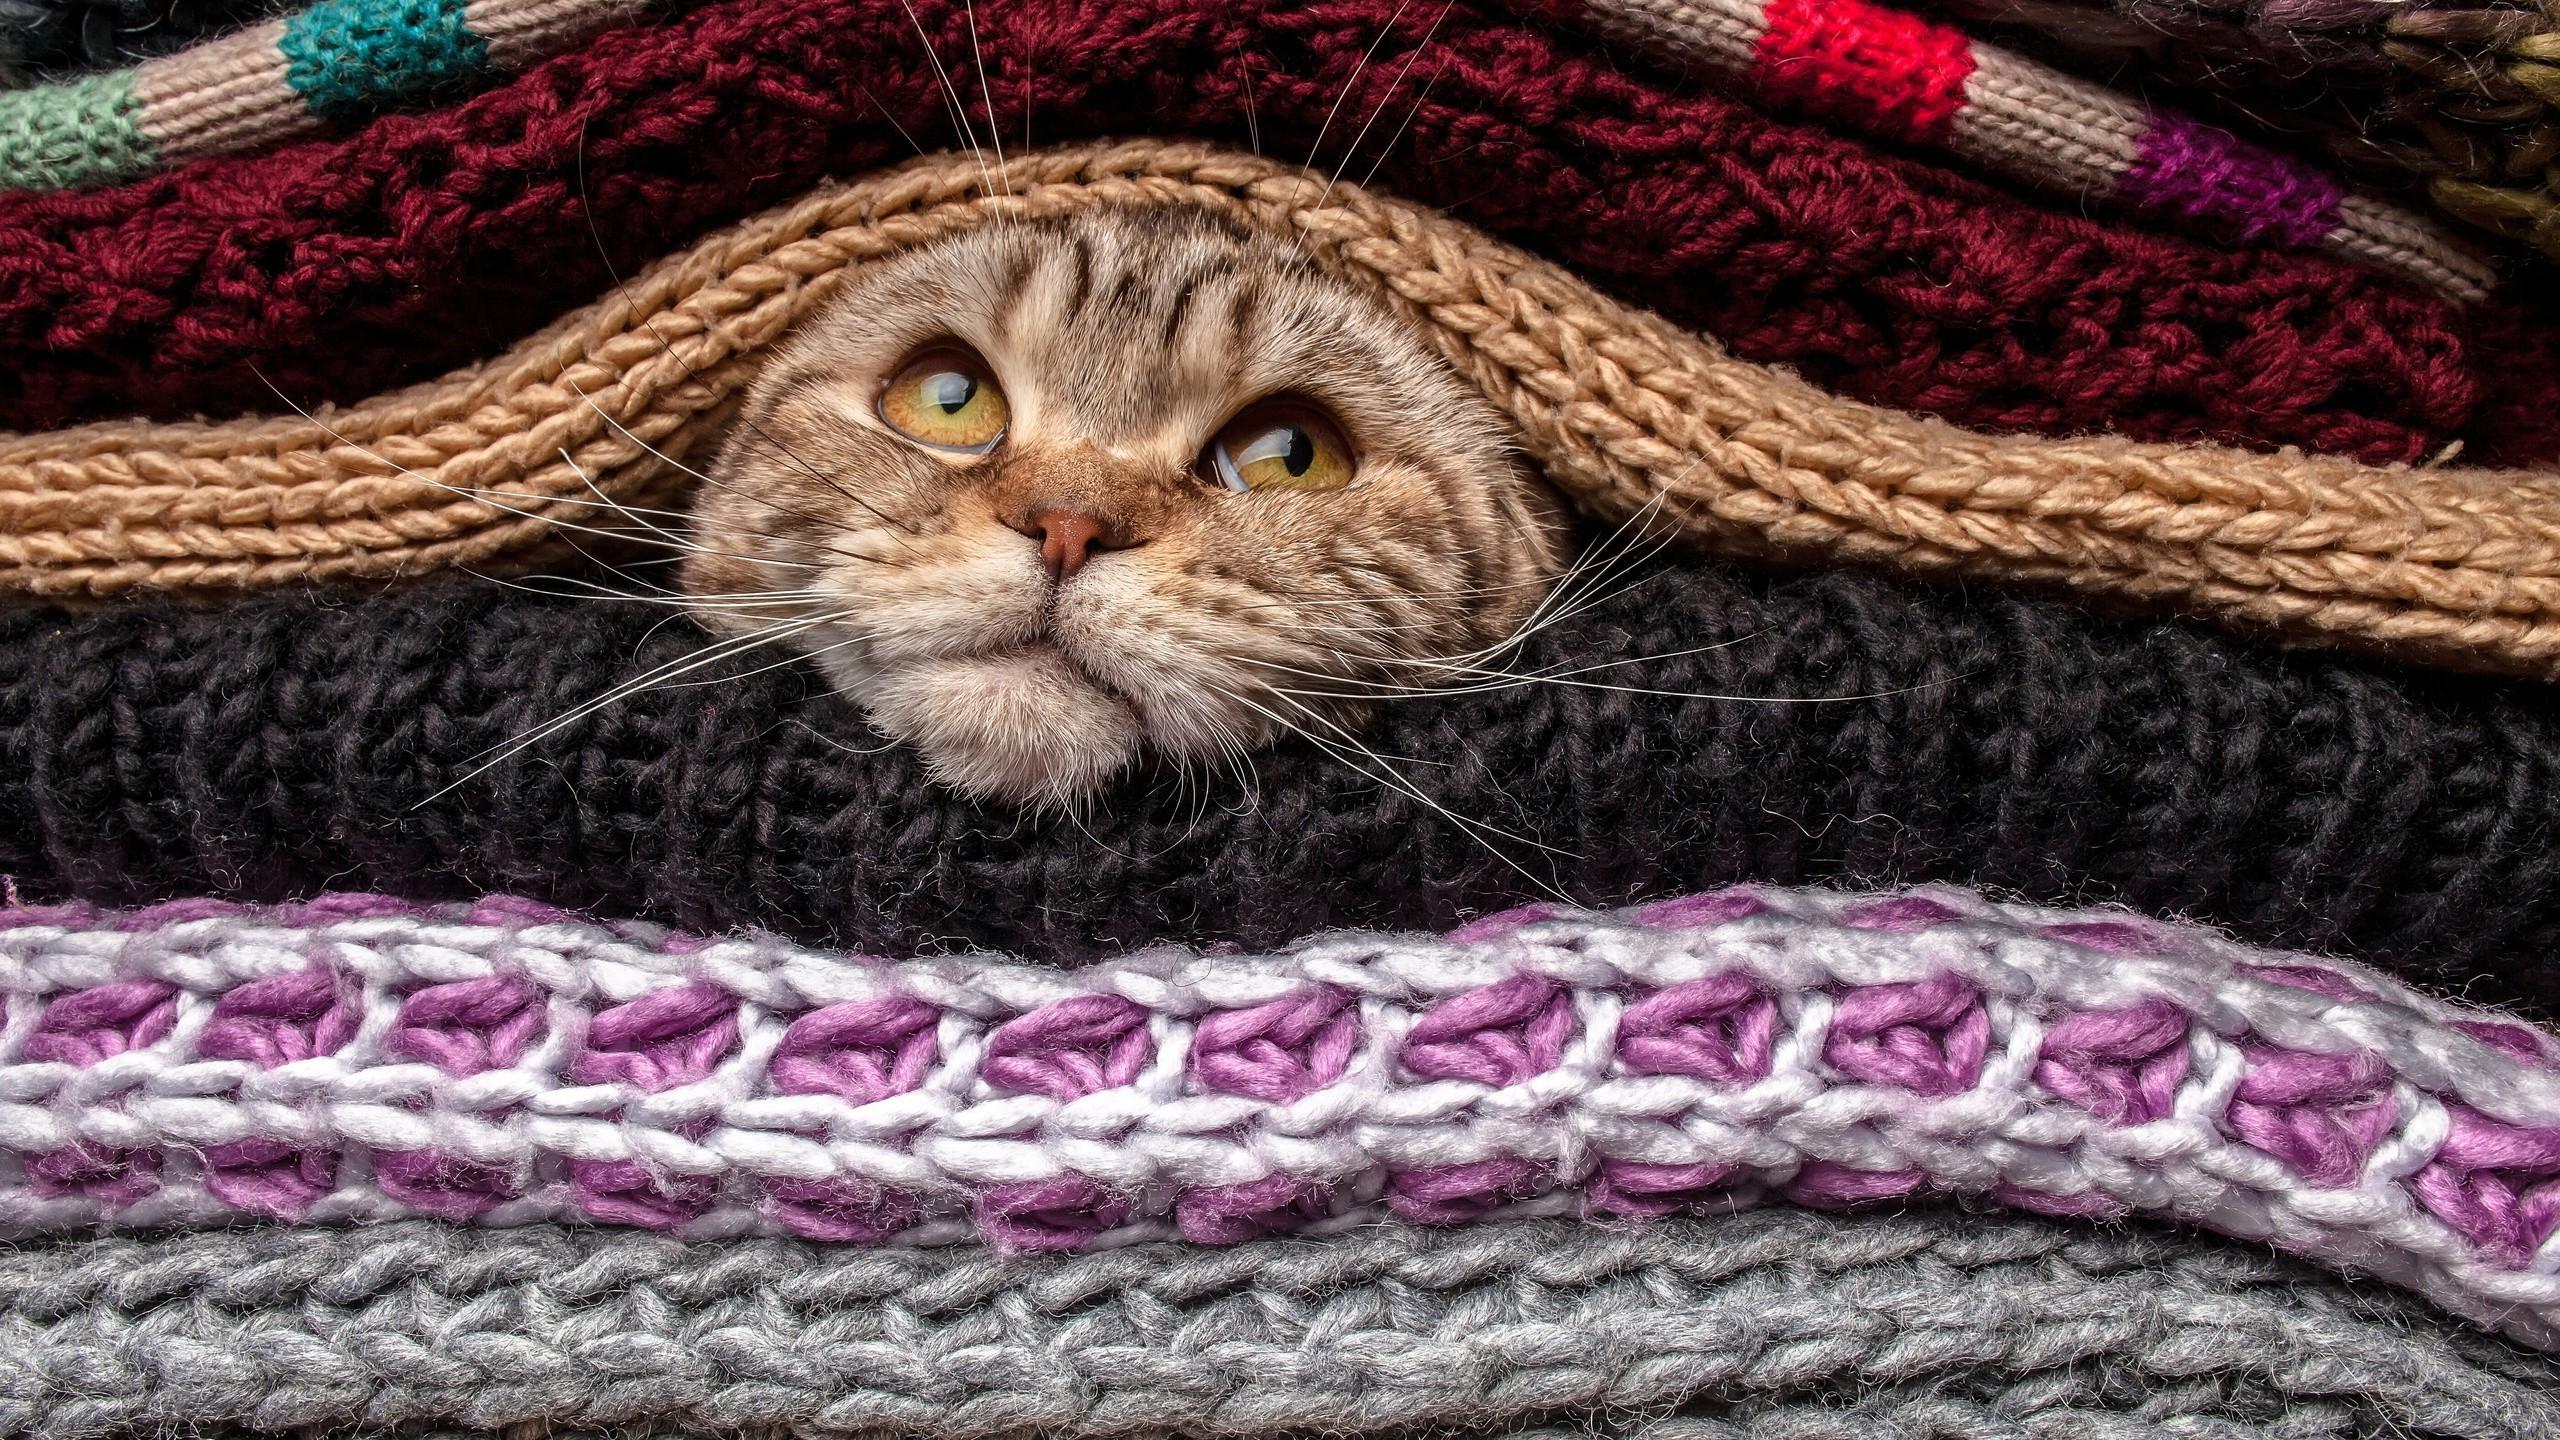 Hintergrundbilder Tiere Sweatshirt Wolle Haustier Kopf Häkeln